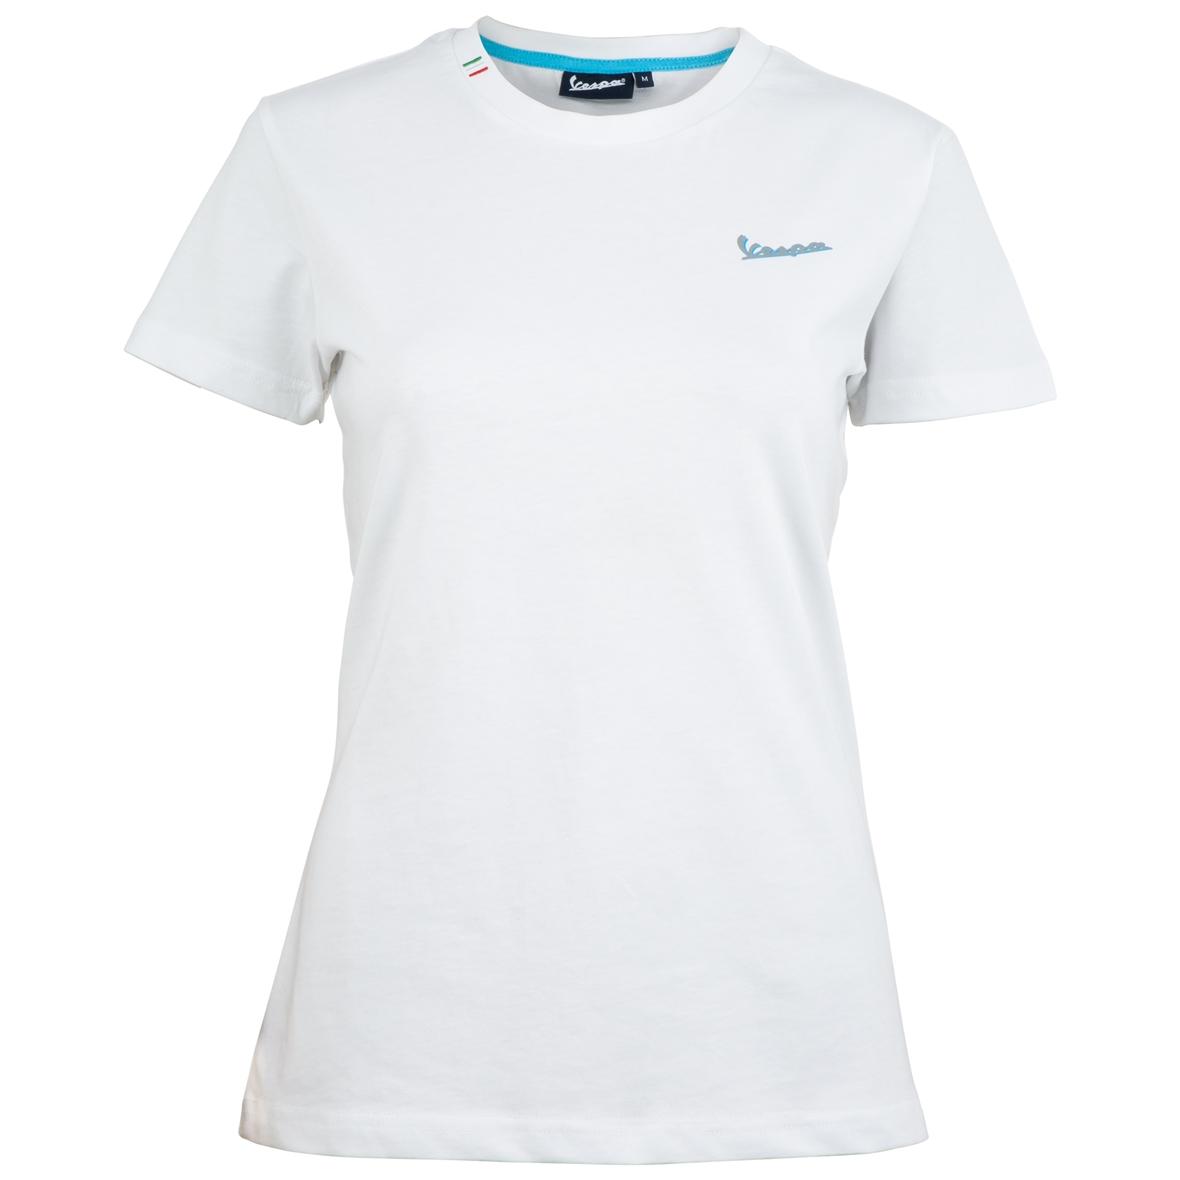 Product Image for 'T-Shirt PIAGGIO Vespa Logo size LTitle'